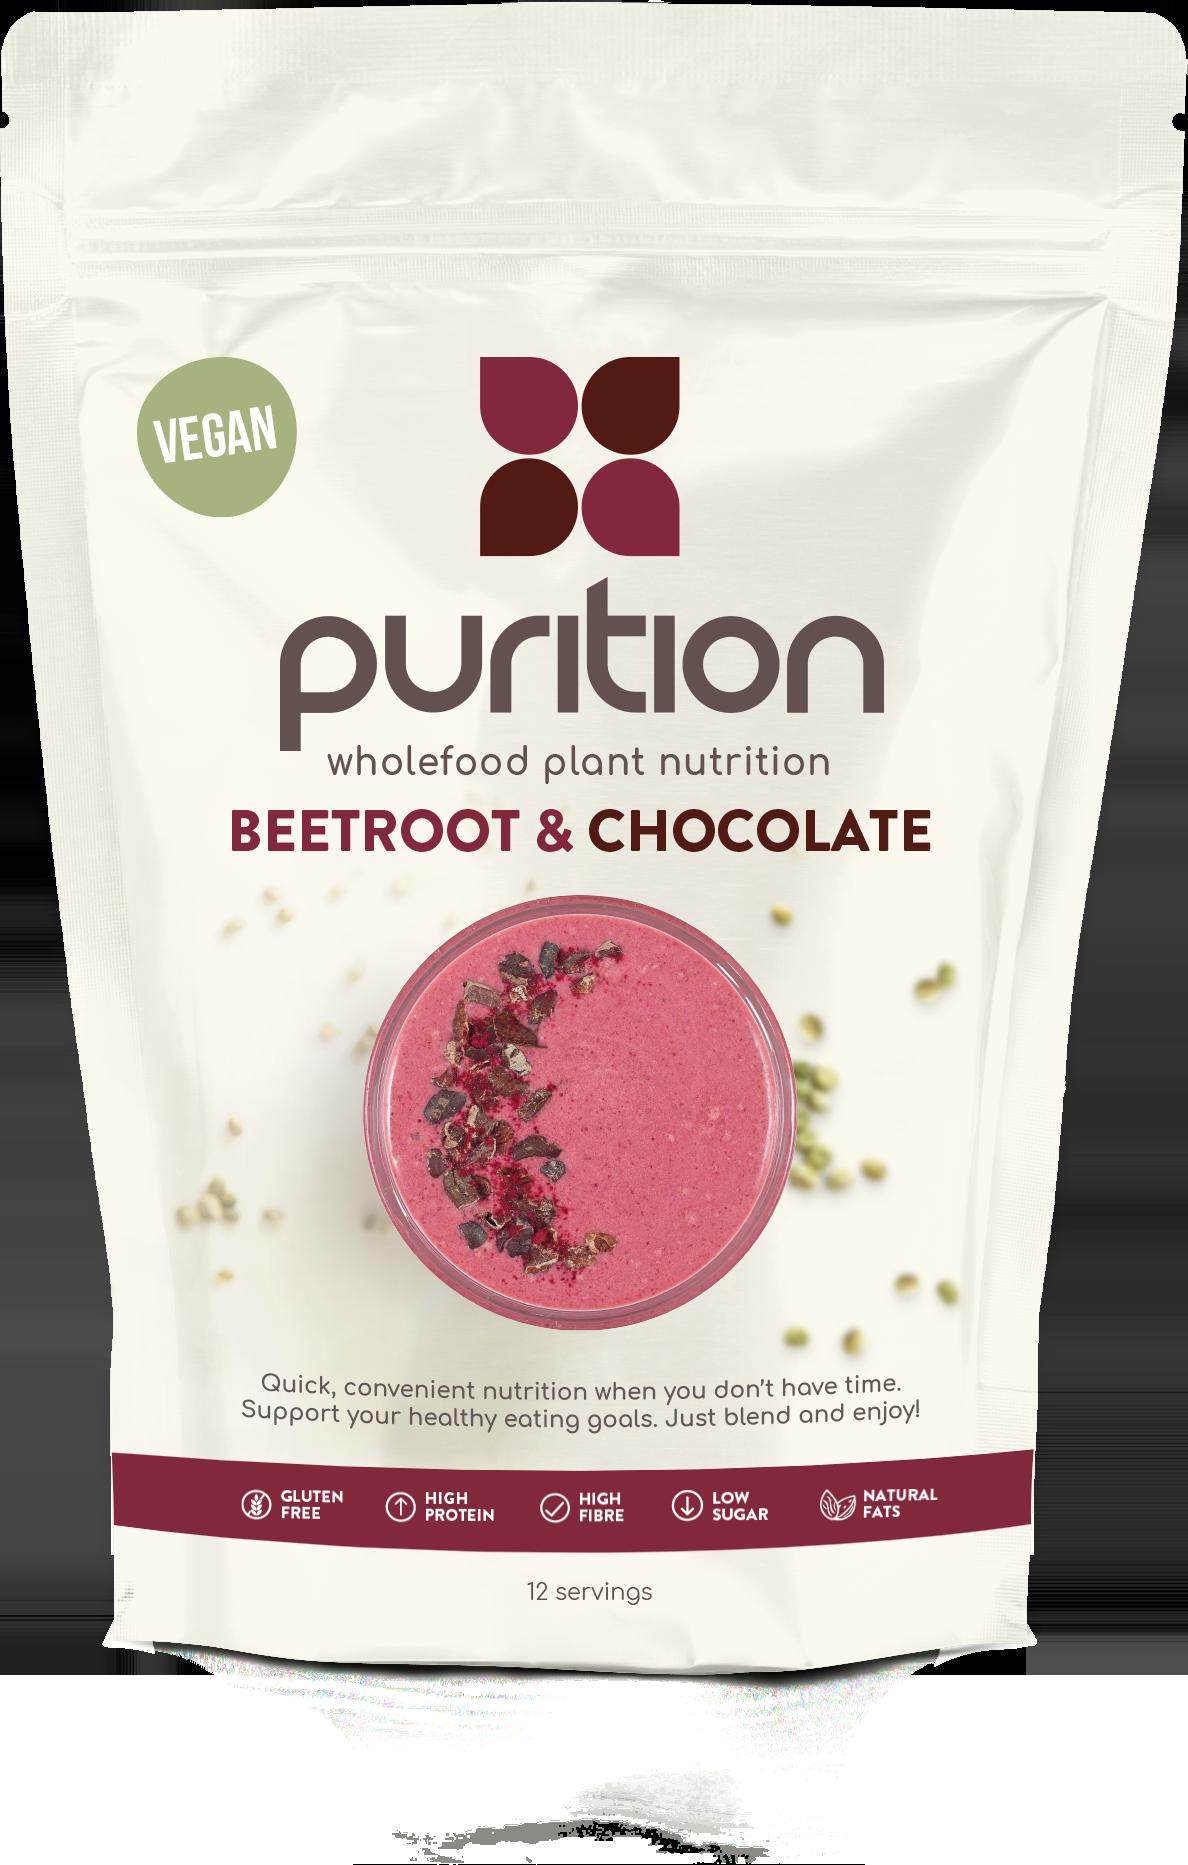 344010 beetroot and chocolate purition vegan f63d18 original 1580385537